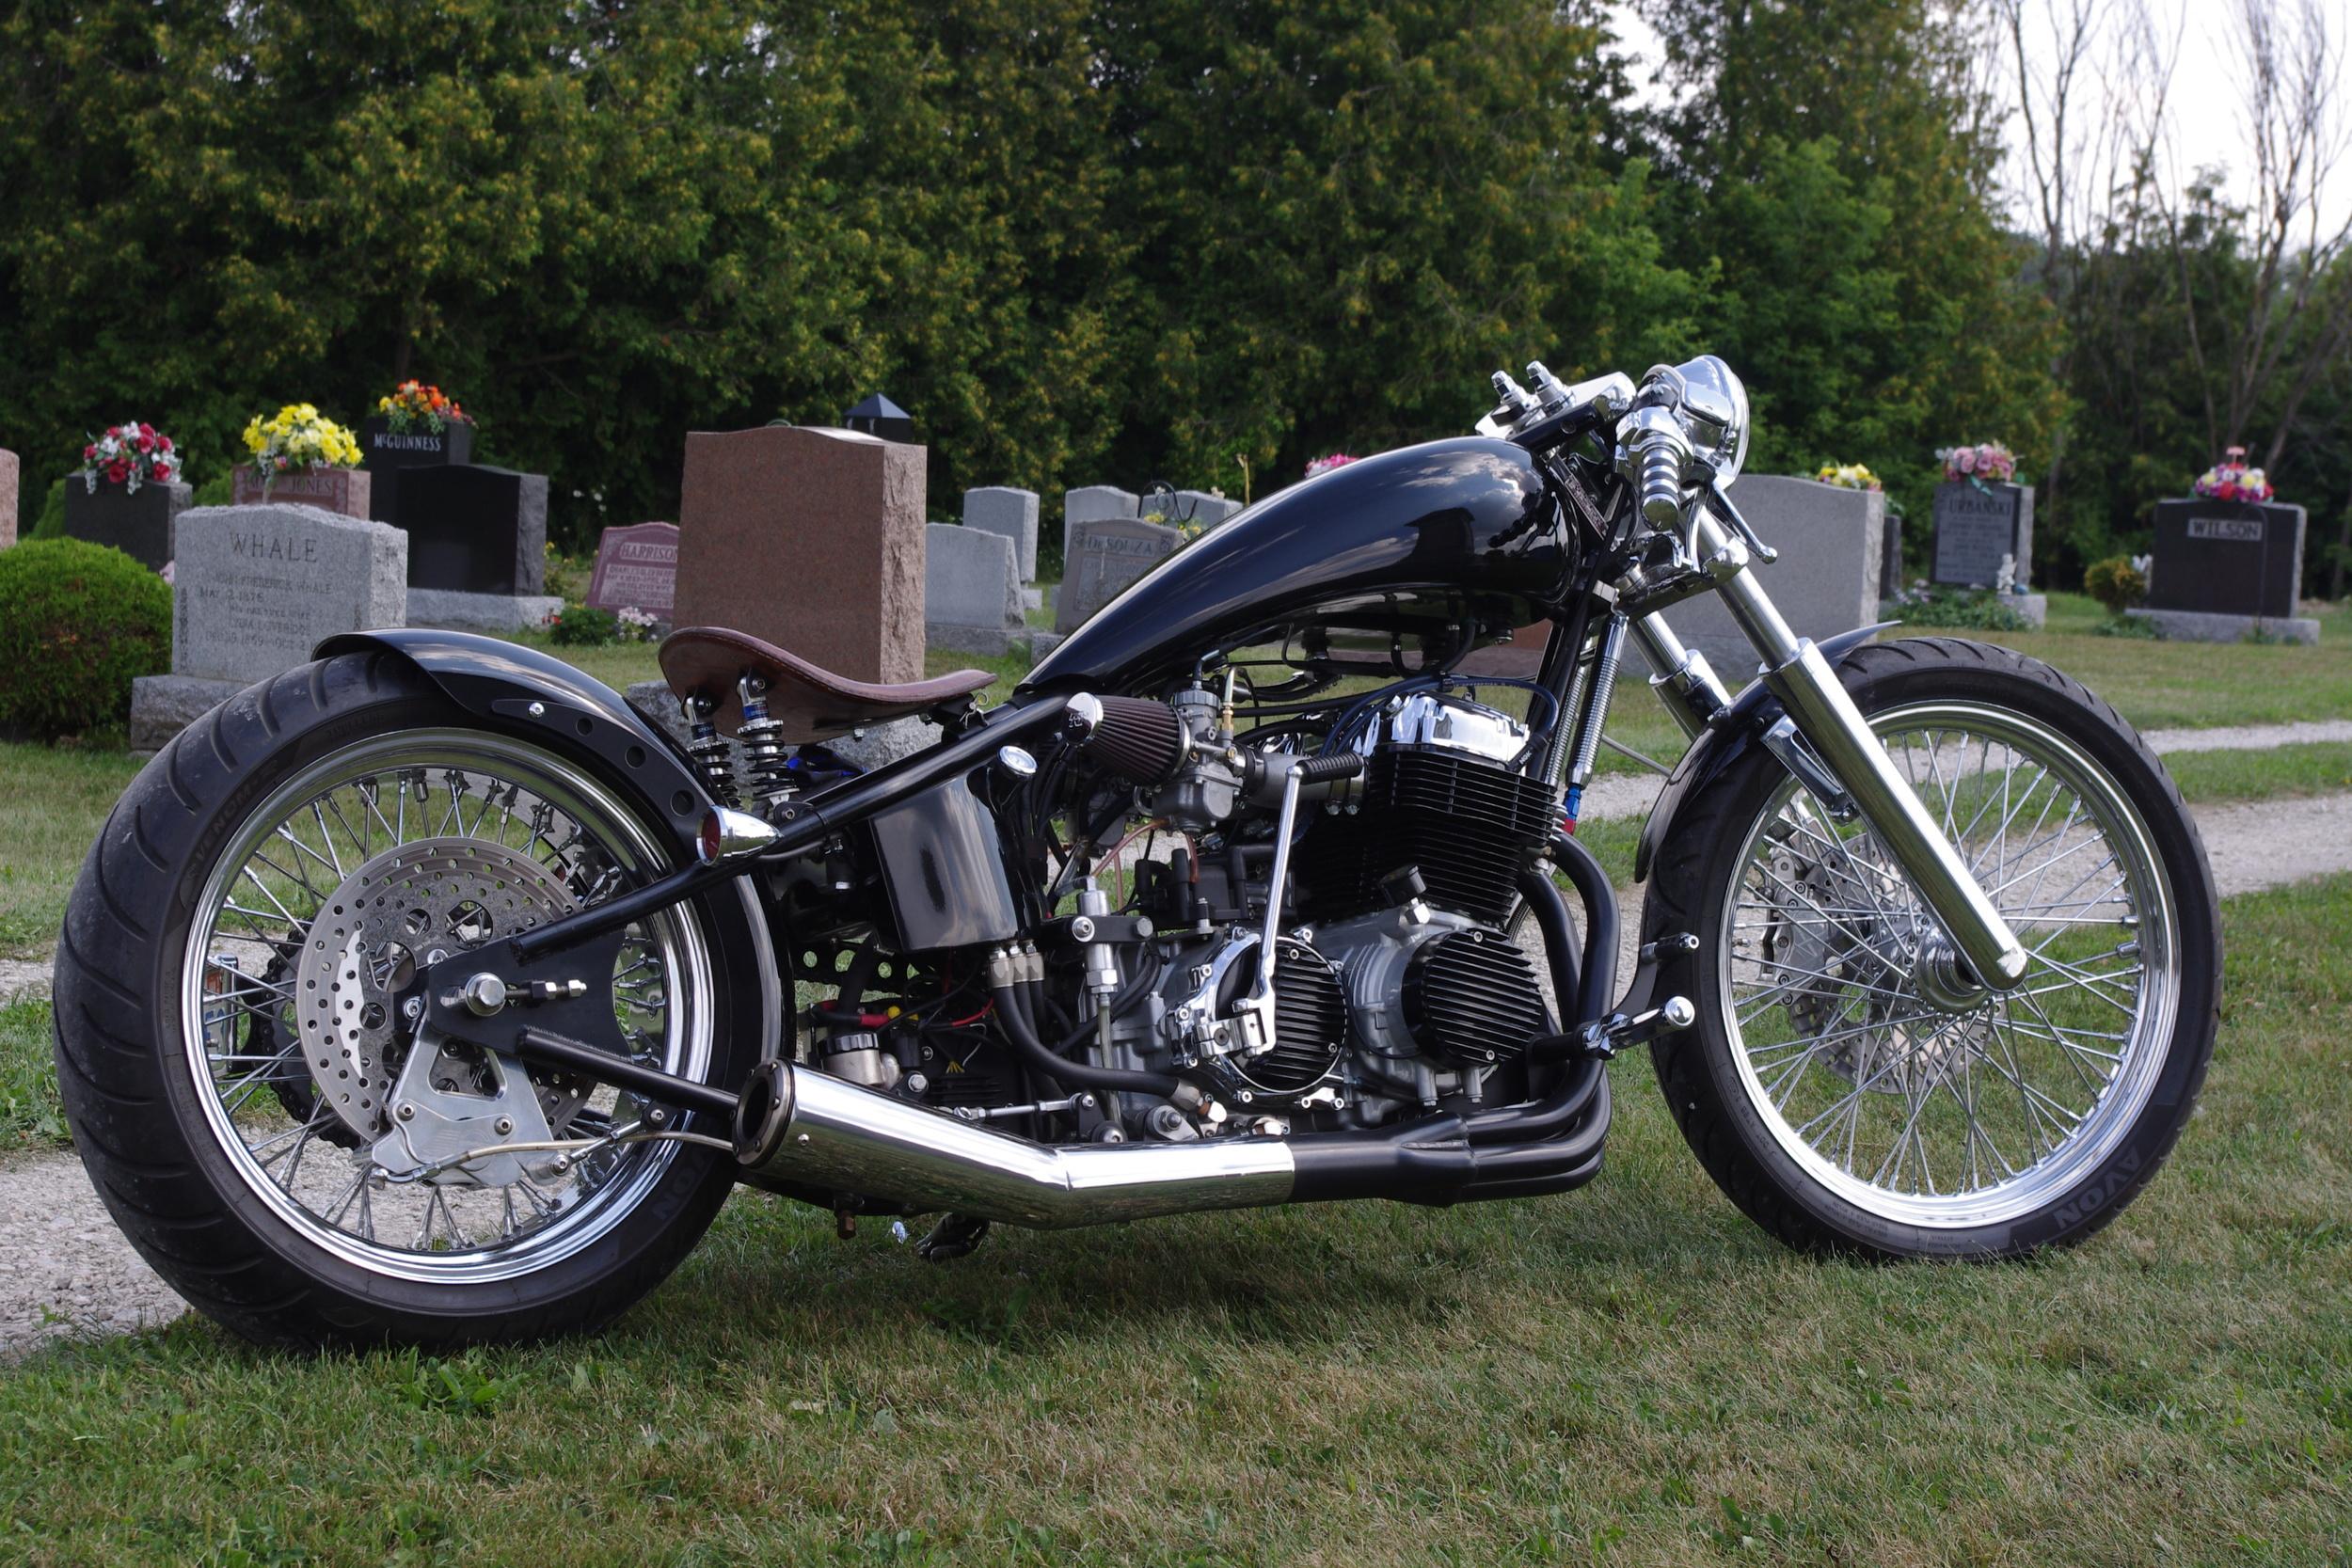 Deviant - A 1975 CB750F Hardtailed Ripper